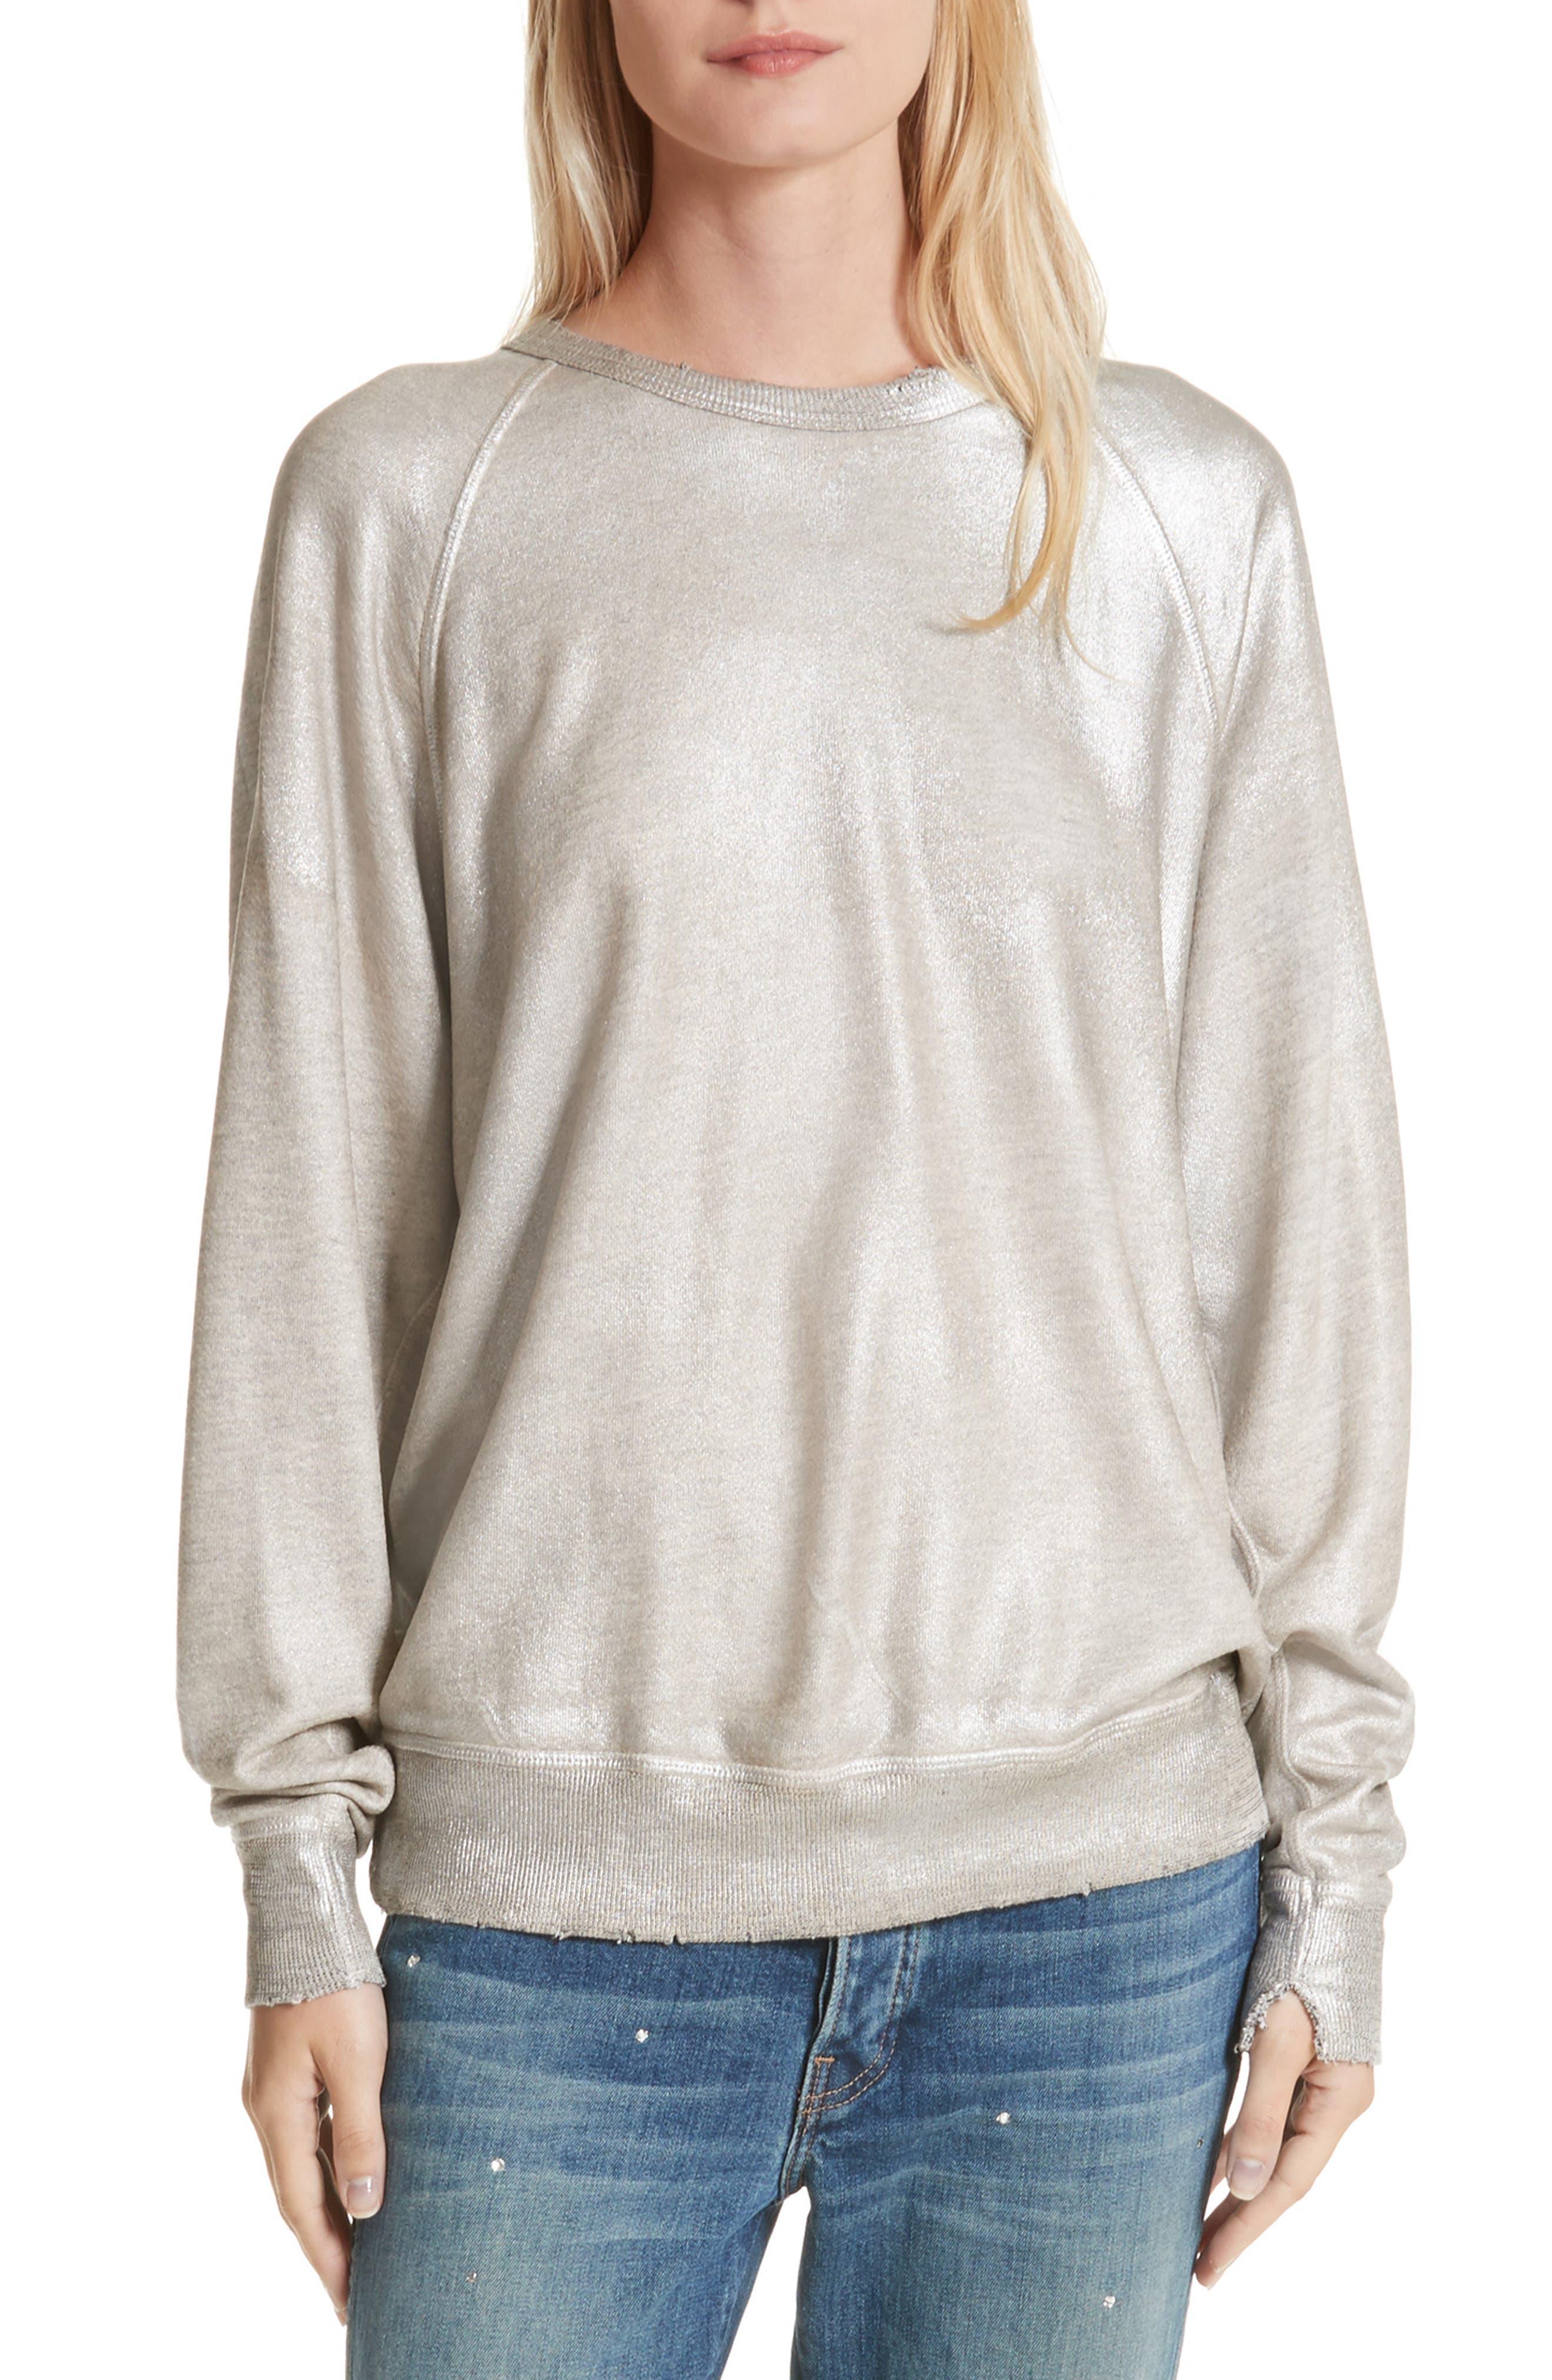 THE GREAT. The College Metallic Foil Sweatshirt